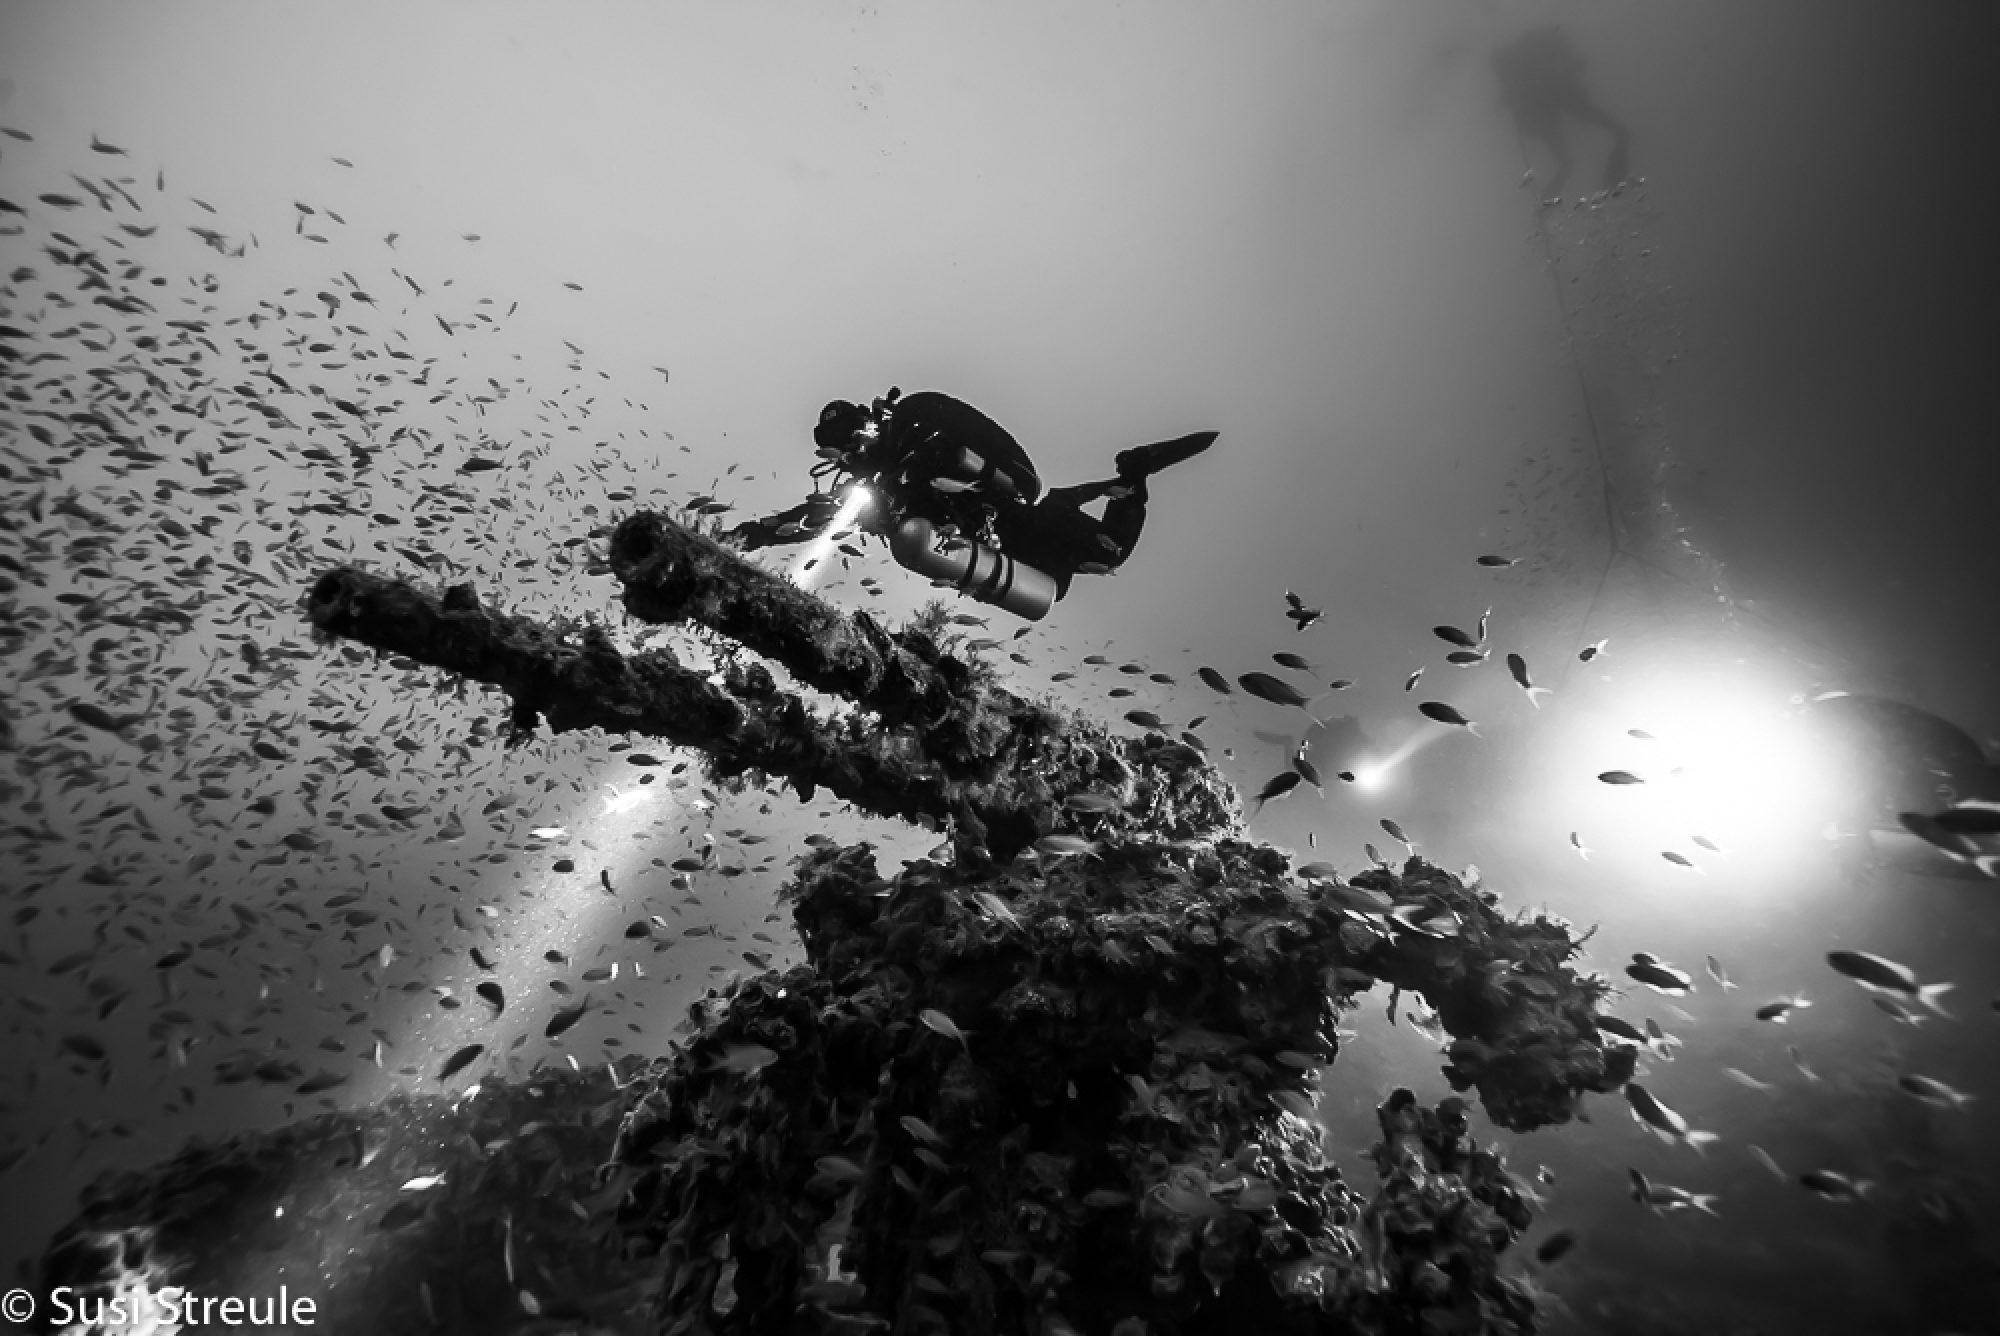 Technical Underwater Support